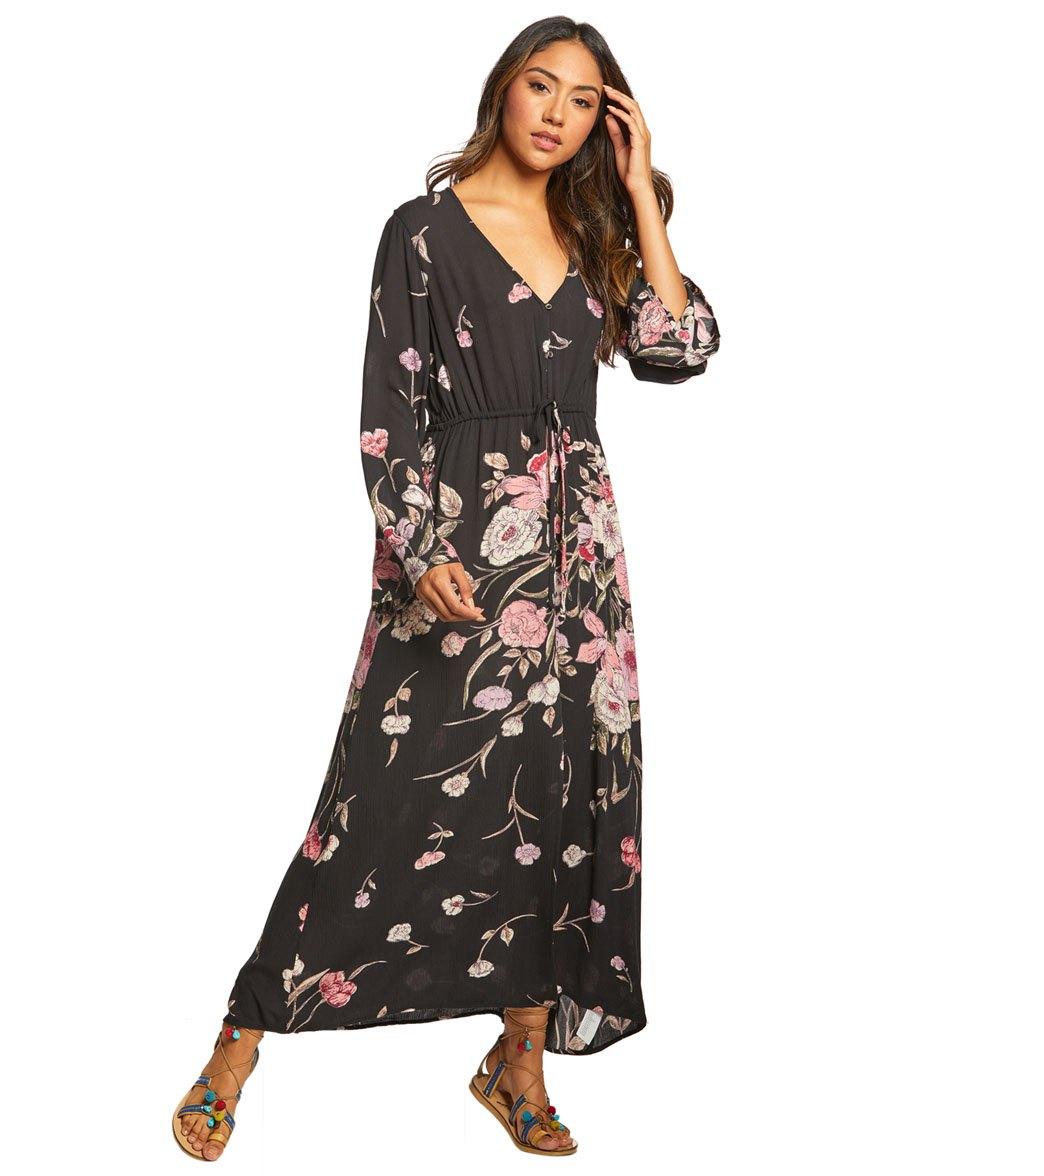 15602aae8f0 Billabong Women s Desi Kimono Dress at SwimOutlet.com - Free Shipping